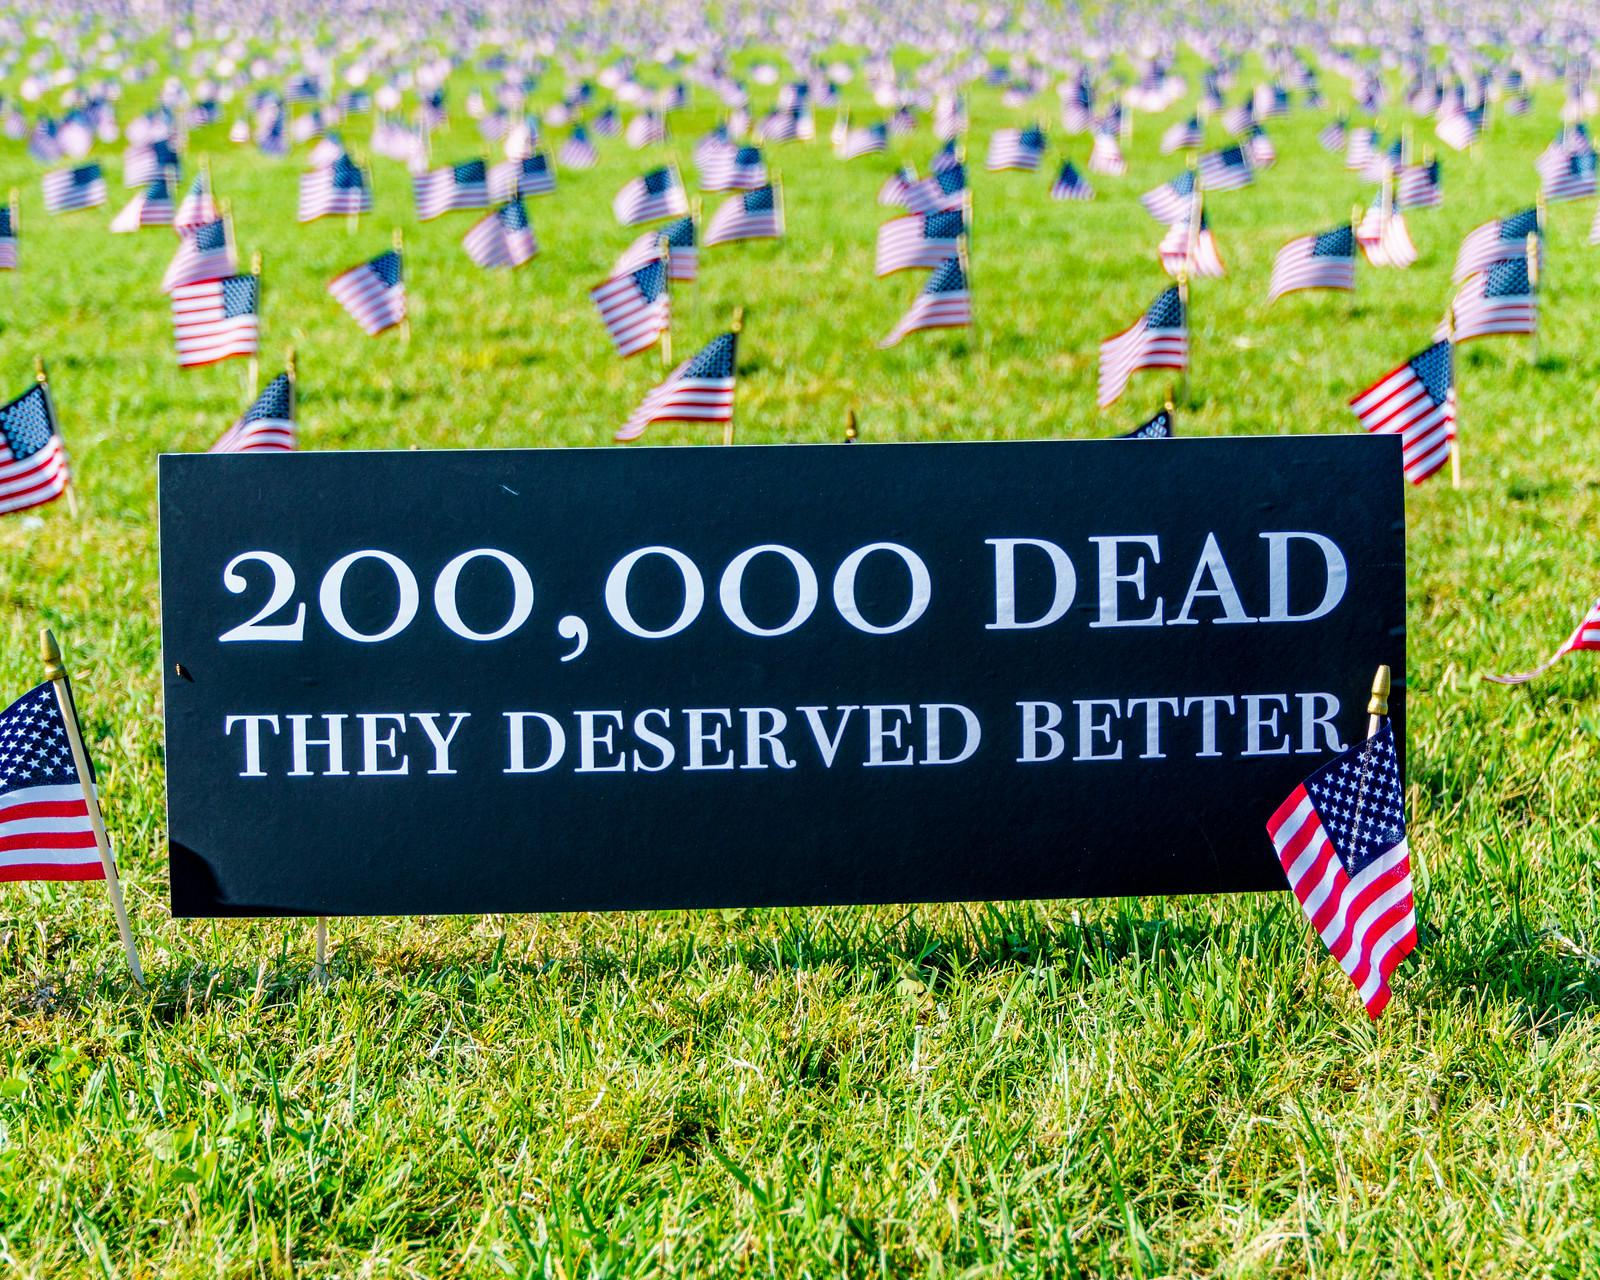 Photo Friday: They Deserved Better, Washington, DC USA